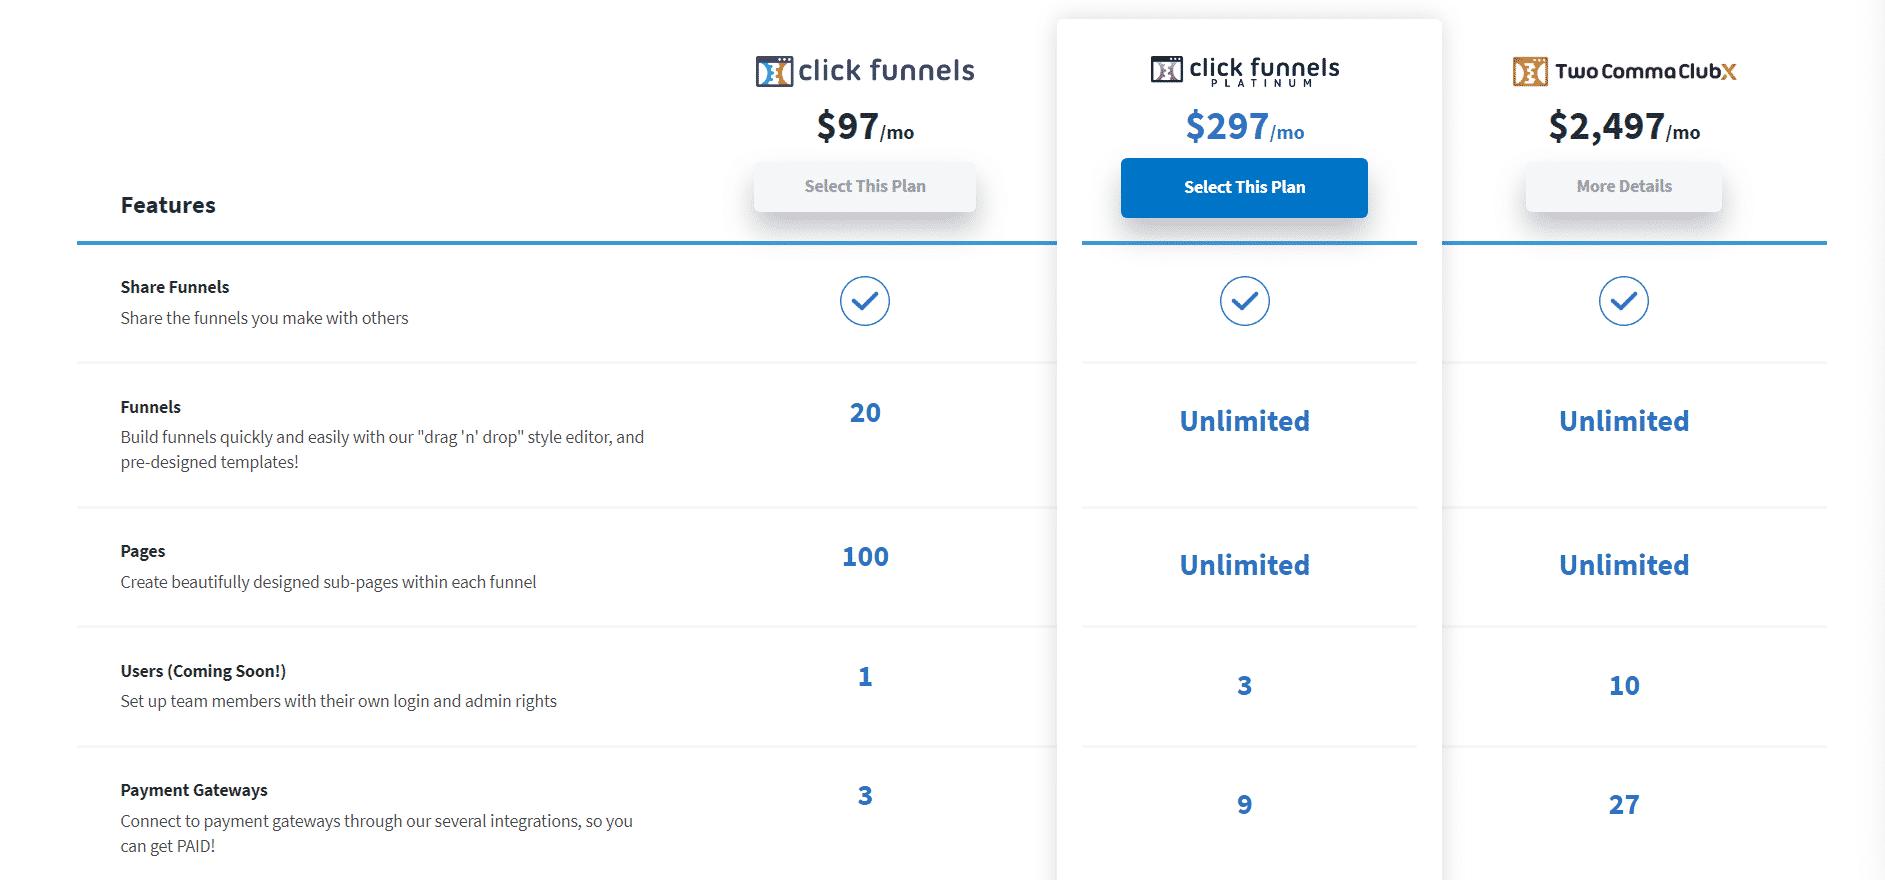 ClickFunnels Price 2020